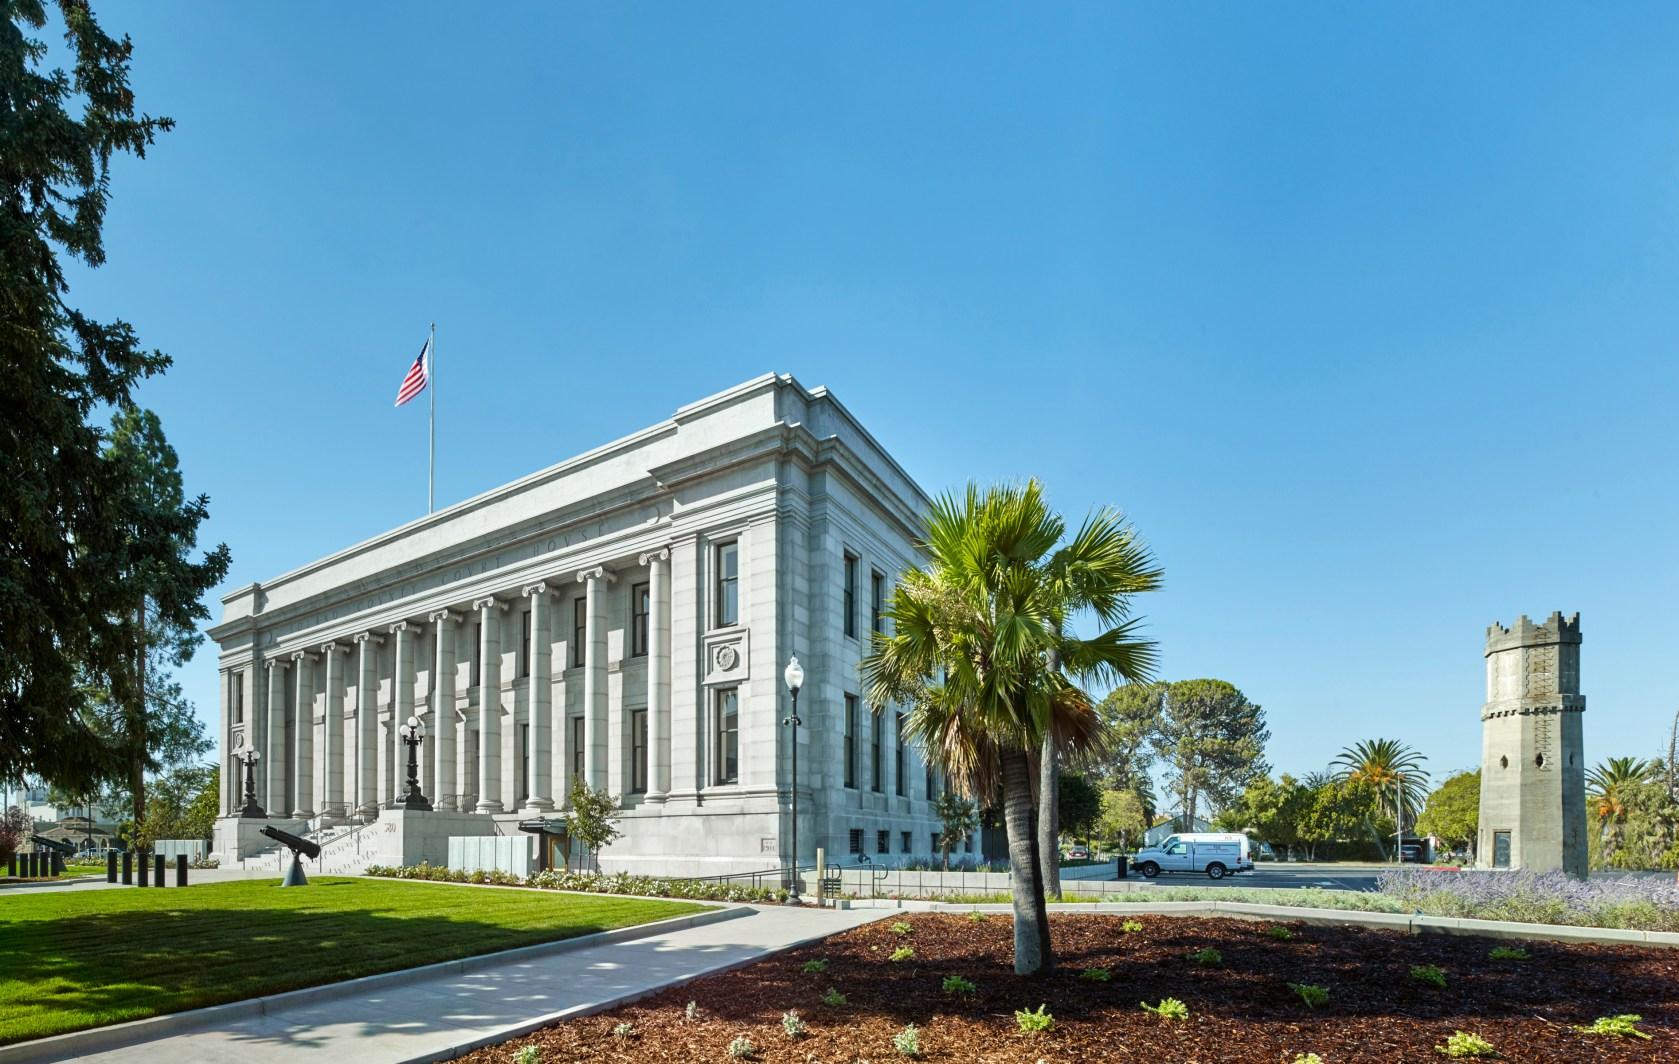 Solano Courthouse Historic Renovation - Architizer